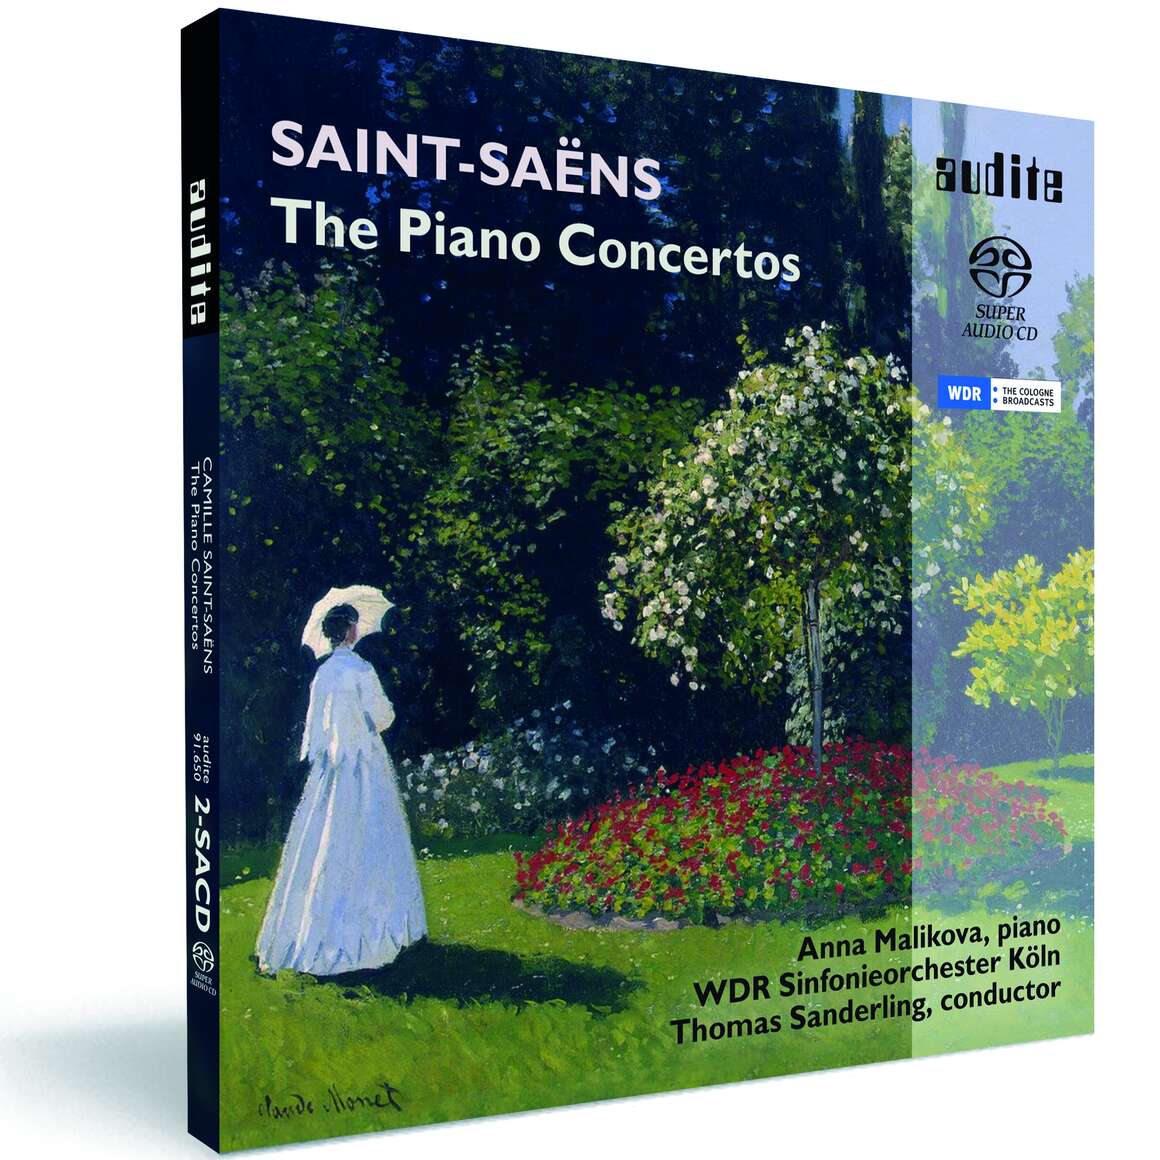 C. Saint-Saëns: Complete Piano Concertos